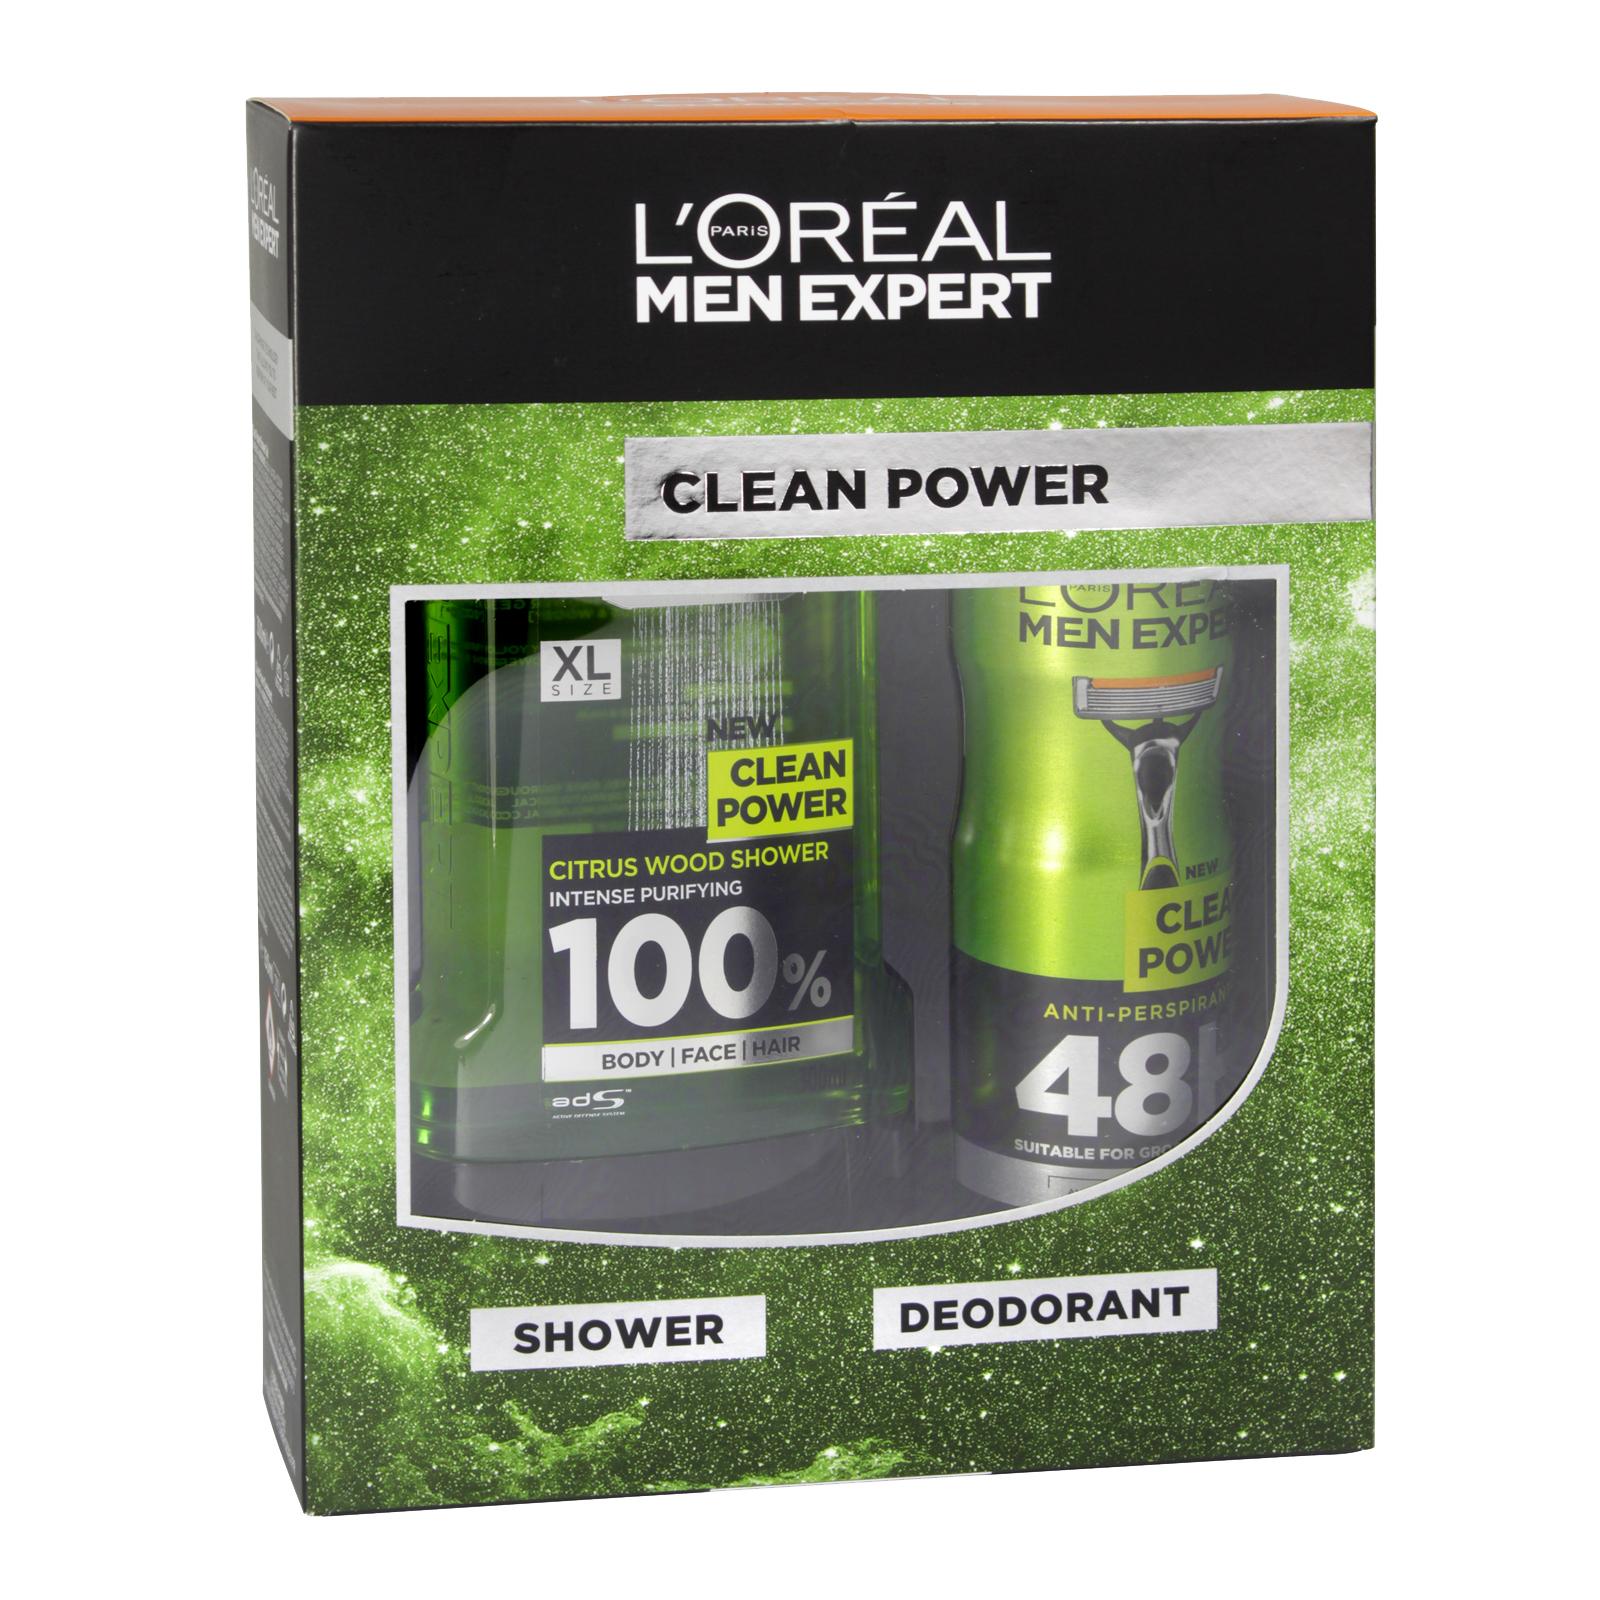 LOREAL MEN EXPERT 300ML SHOWER GEL+150ML DEOD CLEAN POWER